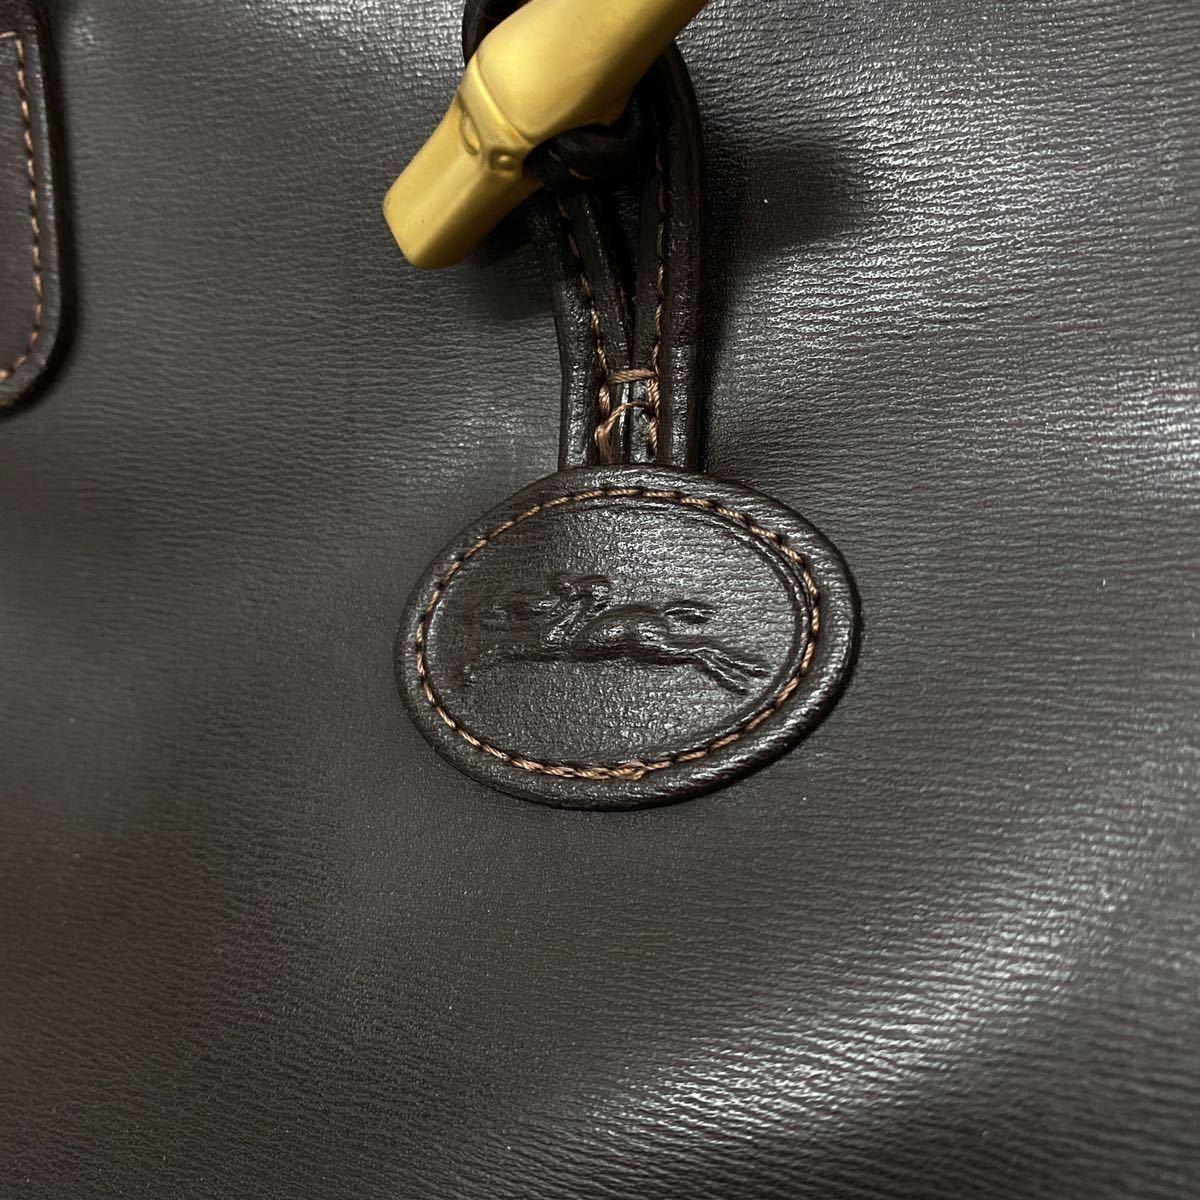 K26 LONGCHAMP ロンシャン トートバッグ ブリーフケース ハンドバッグ ロゾ レザー ロゴマーク 茶色 ブラウン メンズ_画像5